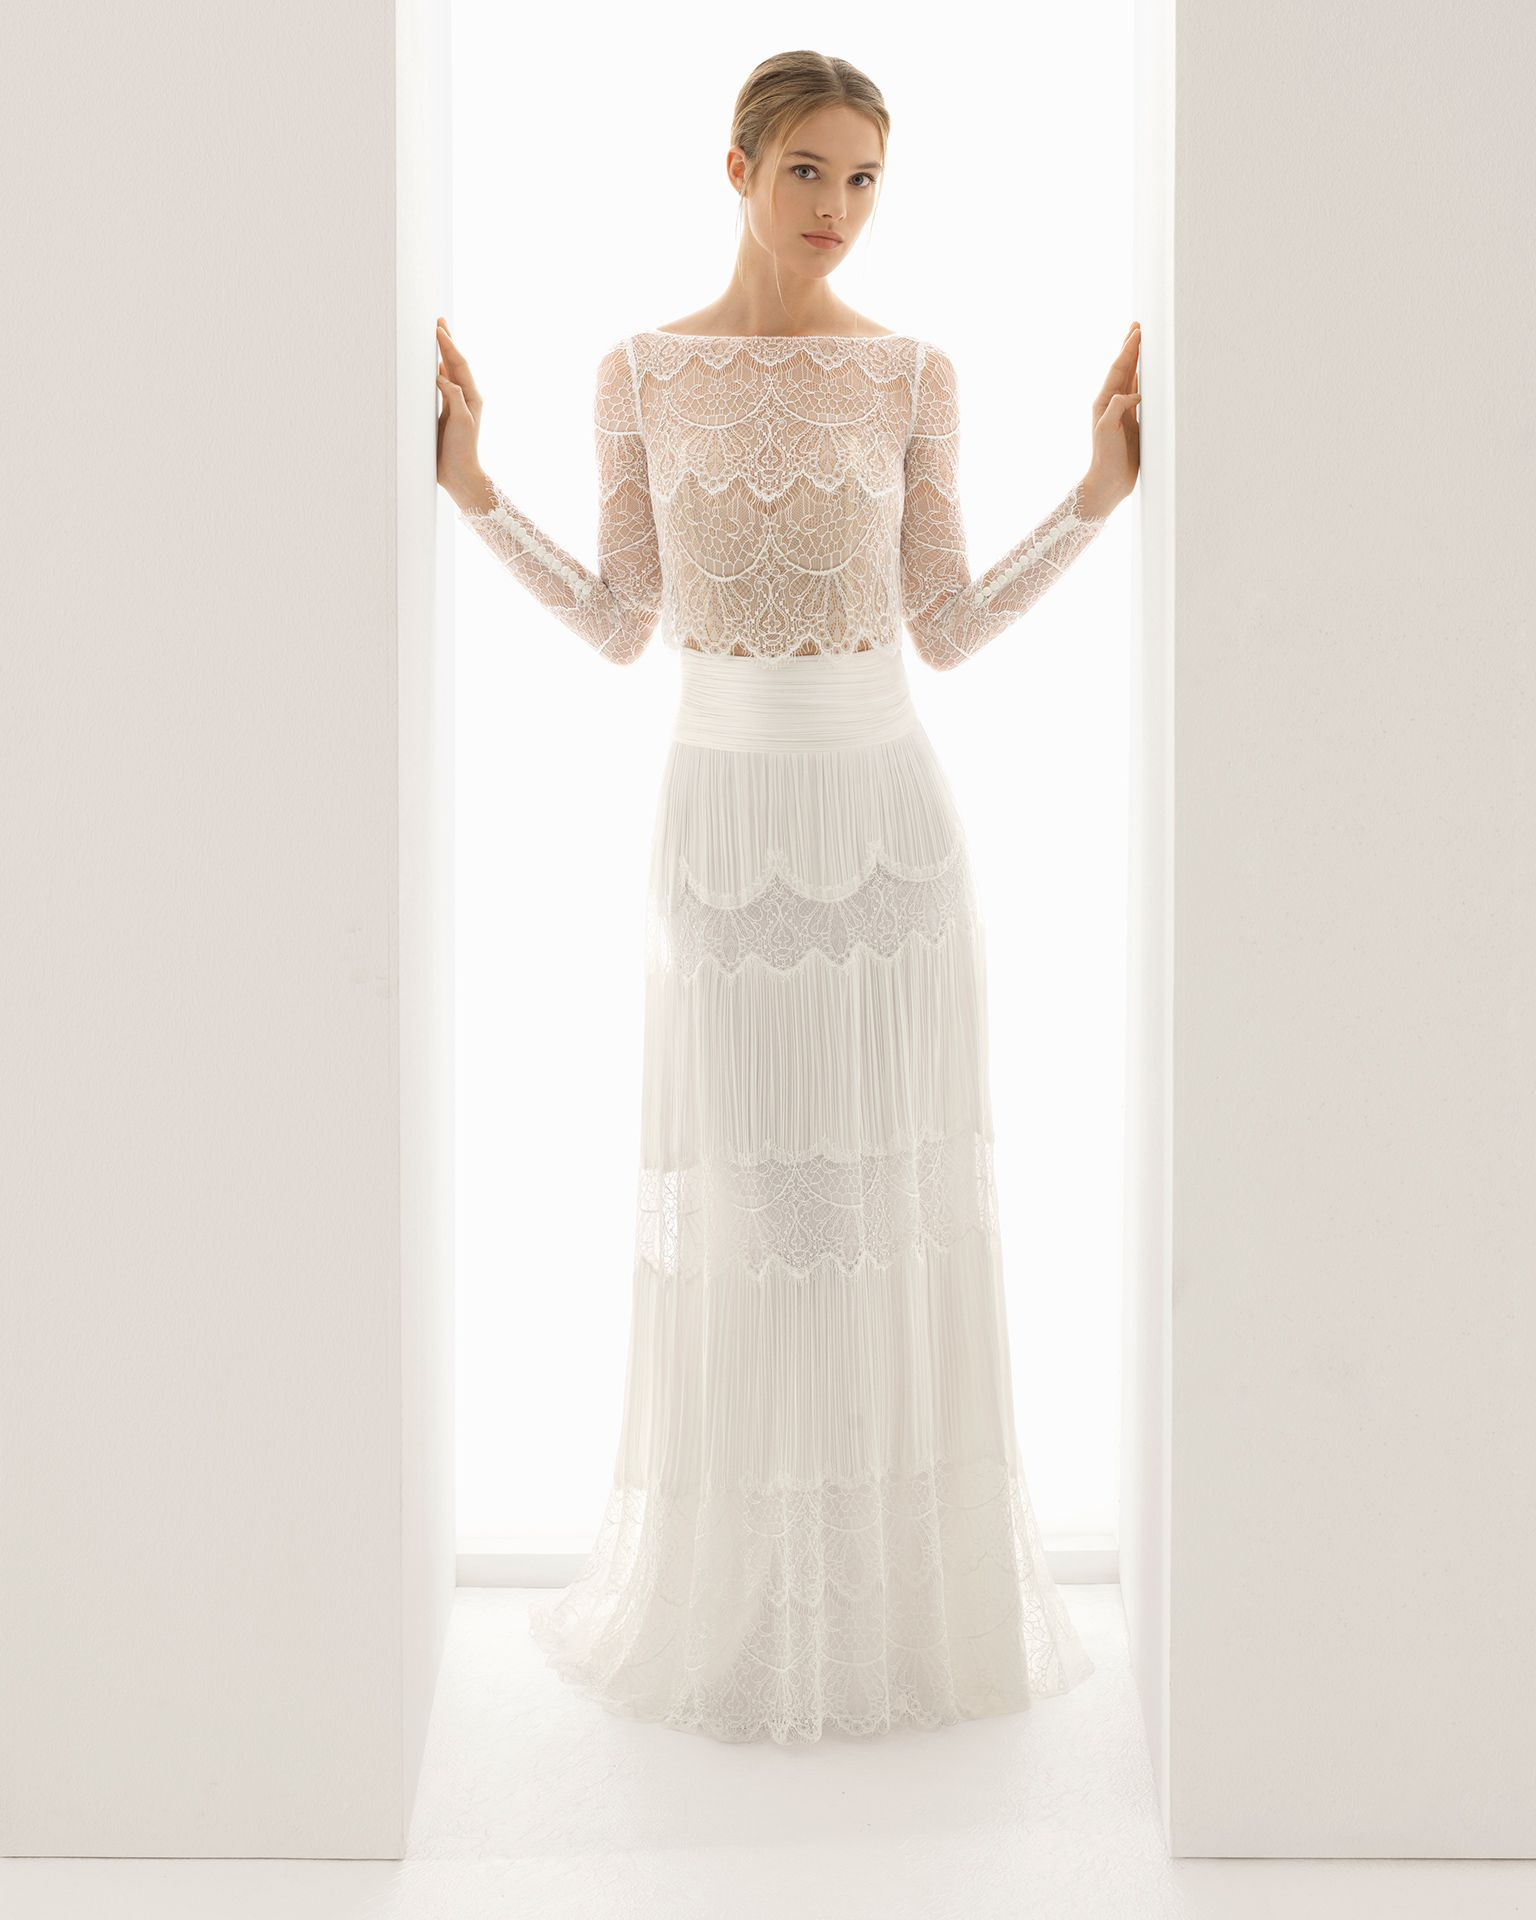 PAVEL - Hochzeit 2018. Kollektion Rosa Clará Couture | Rosa clará ...